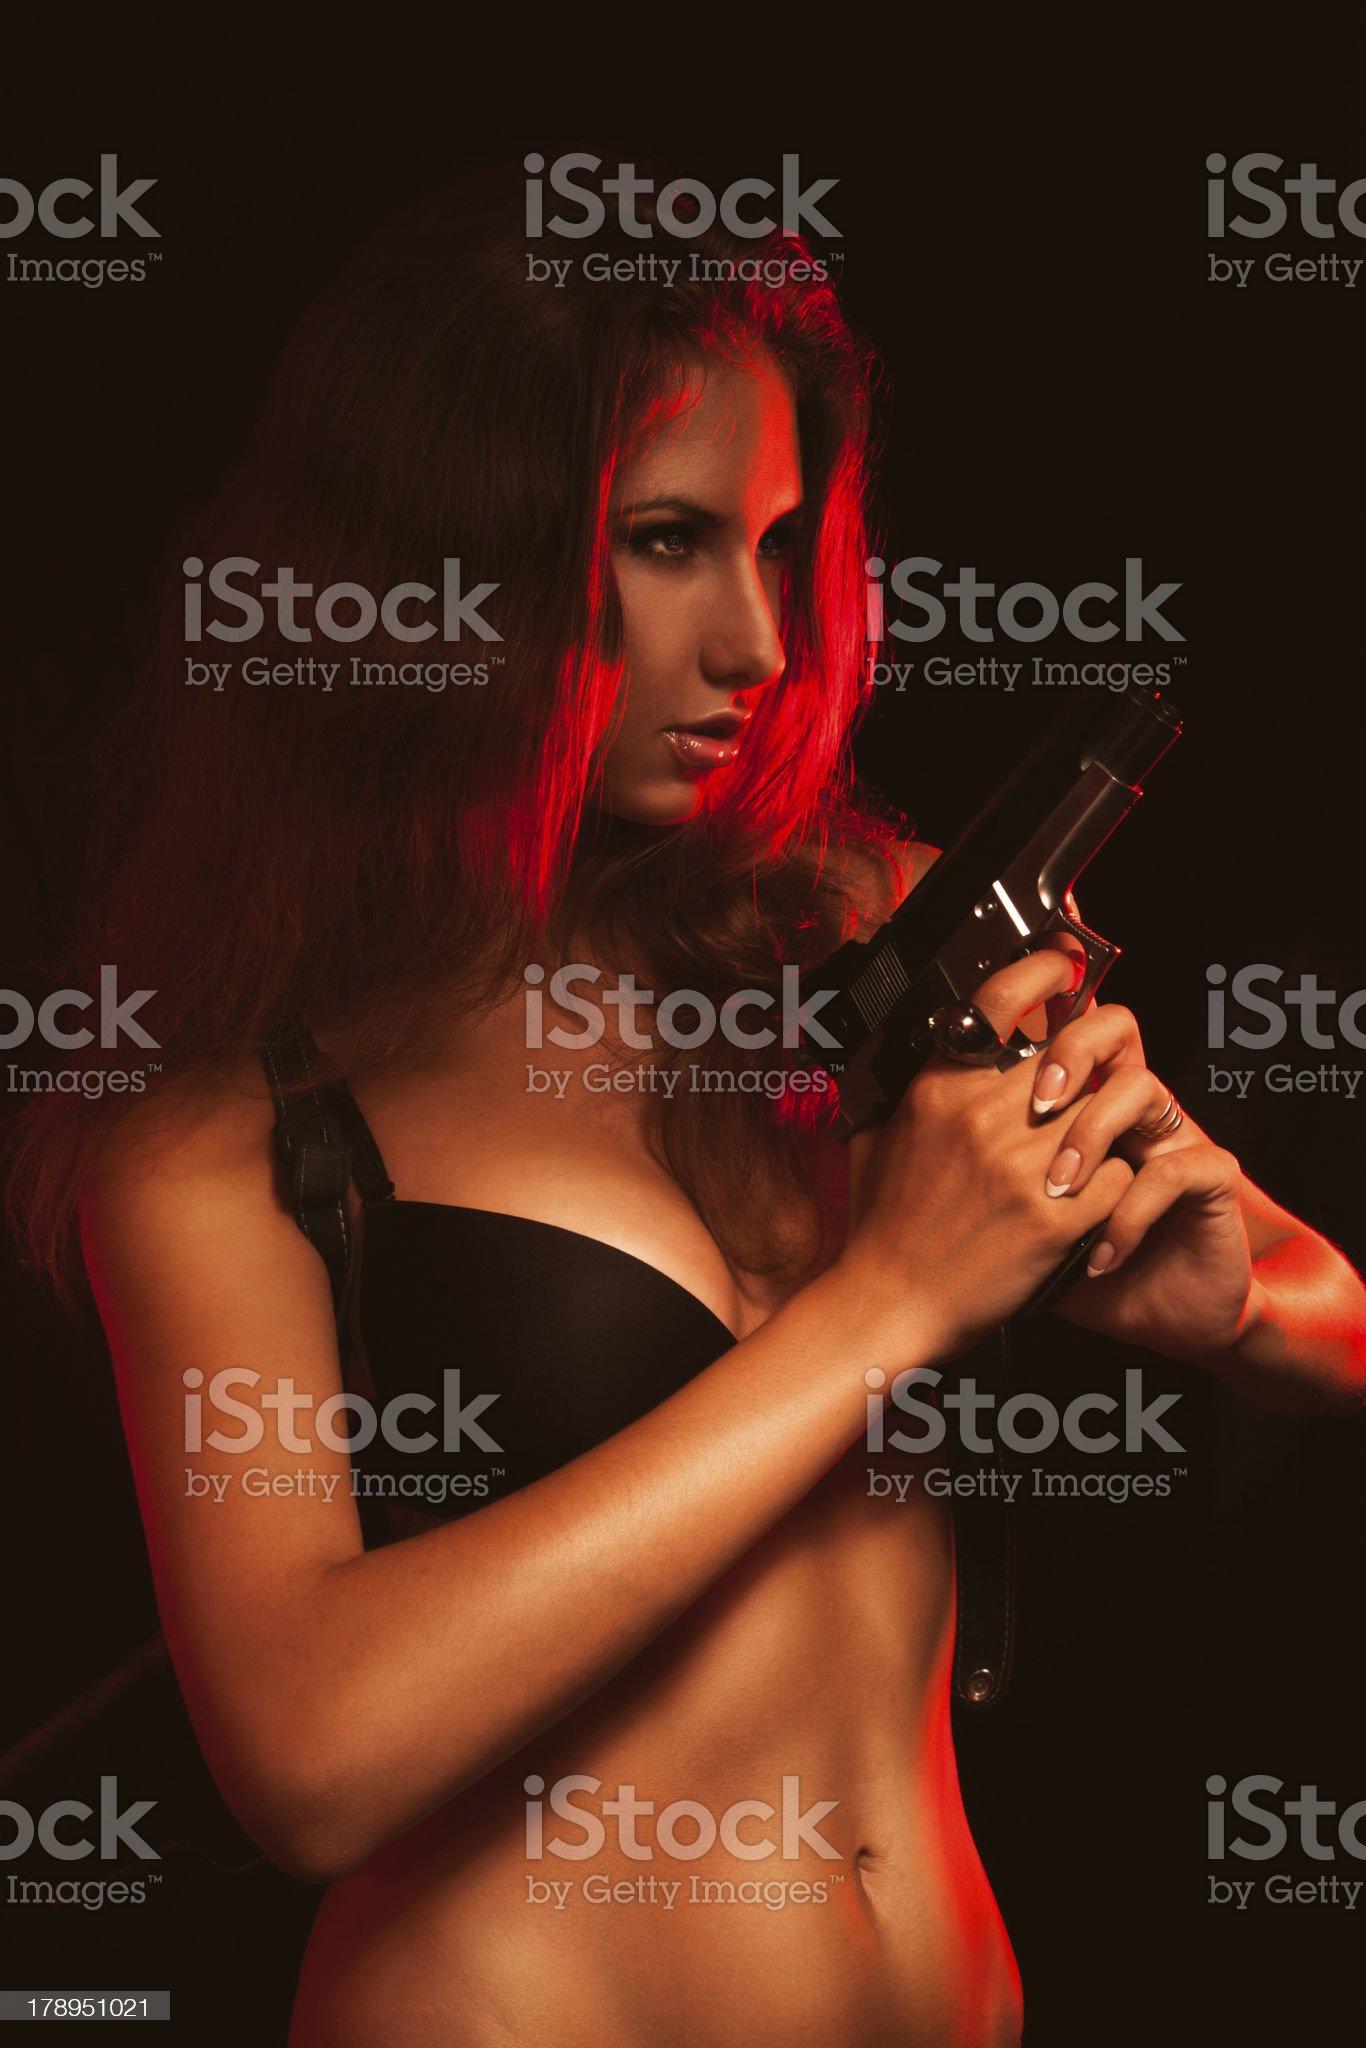 Hot woman in black bra and gun royalty-free stock photo